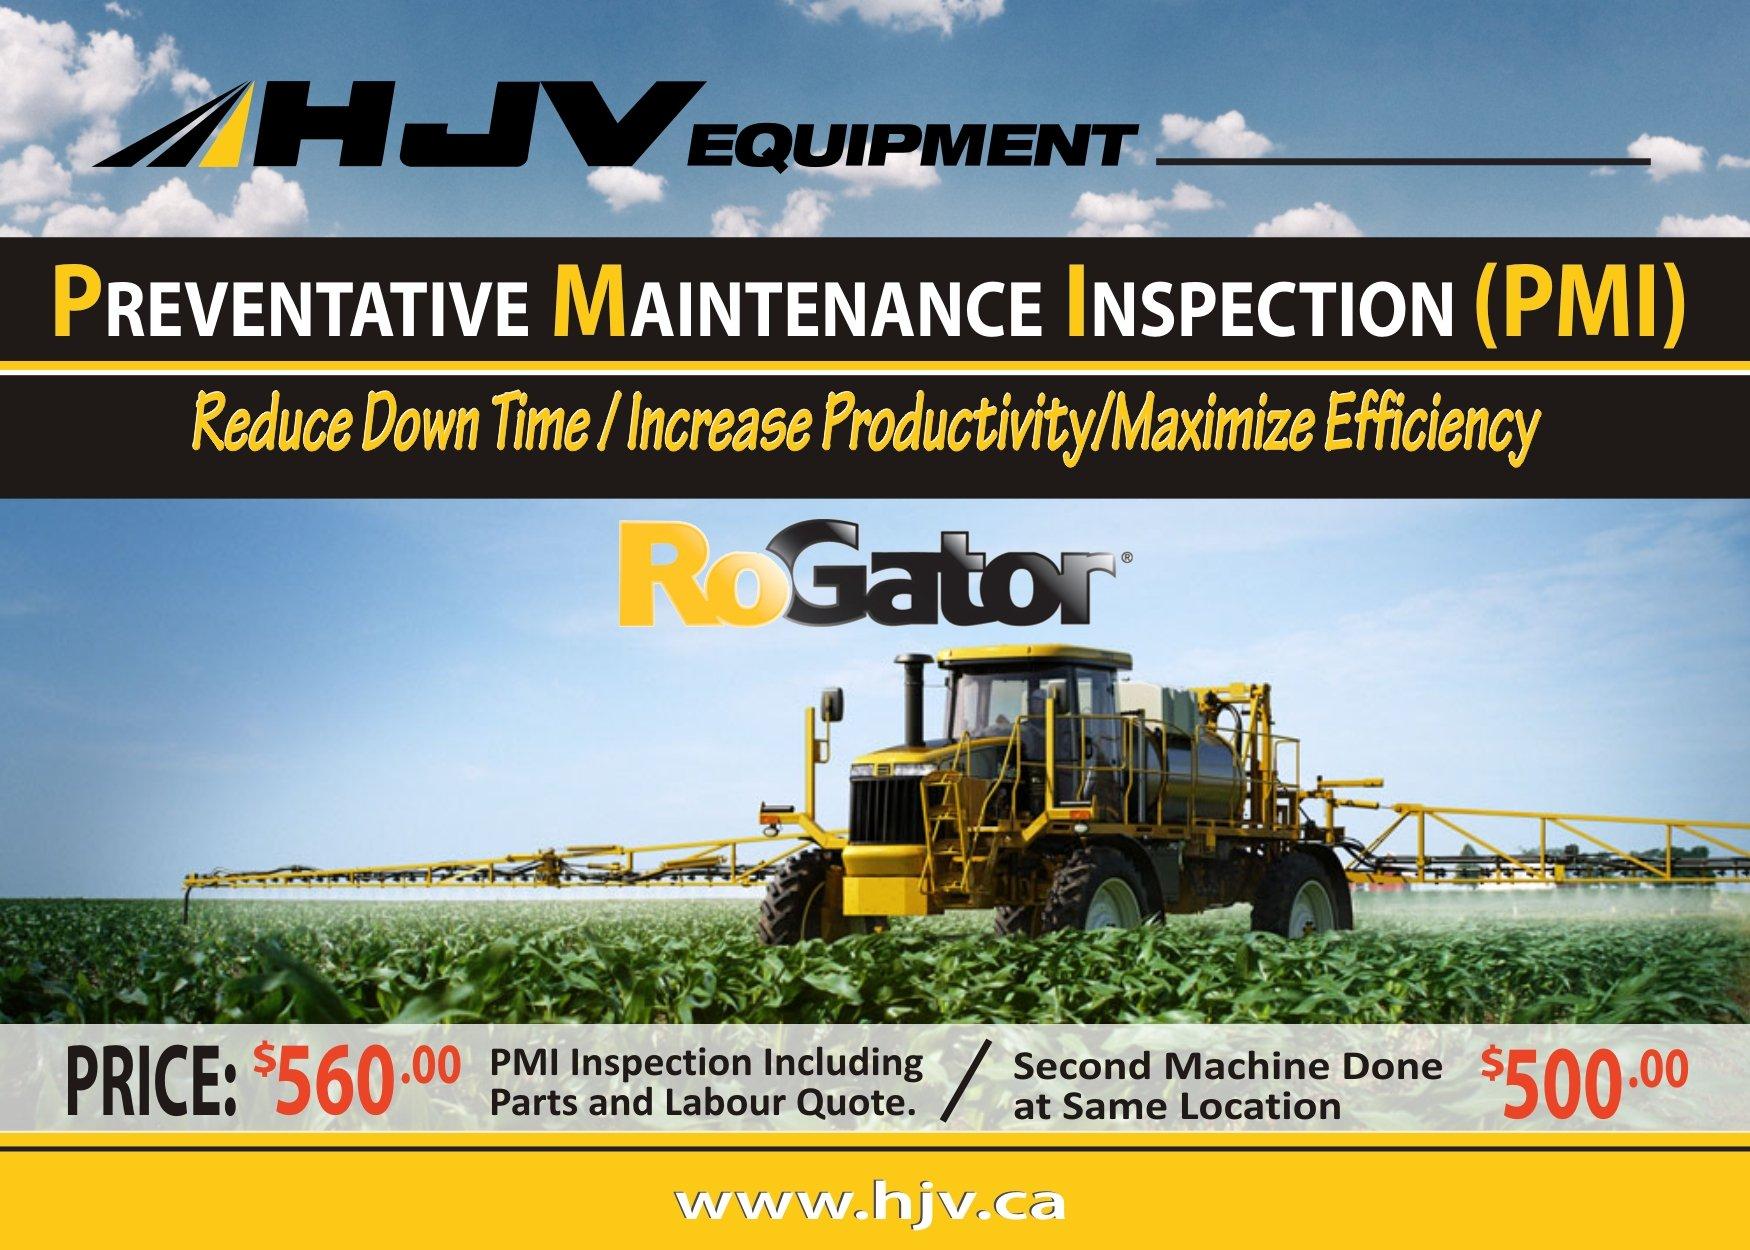 AGCO Rogator PMI - HJV EquipmentHJV Equipment